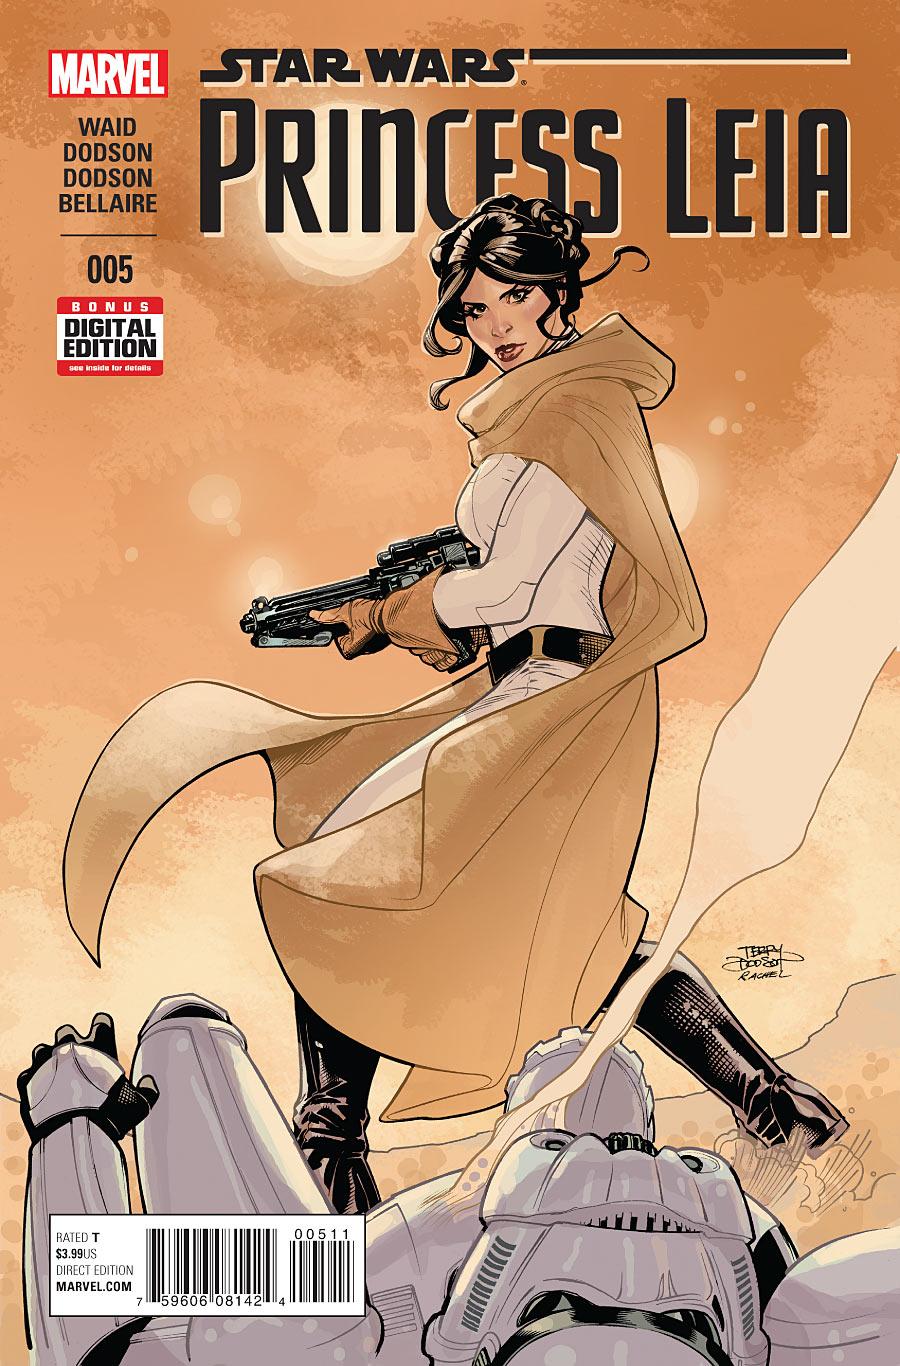 Star Wars: Princess Leia #5